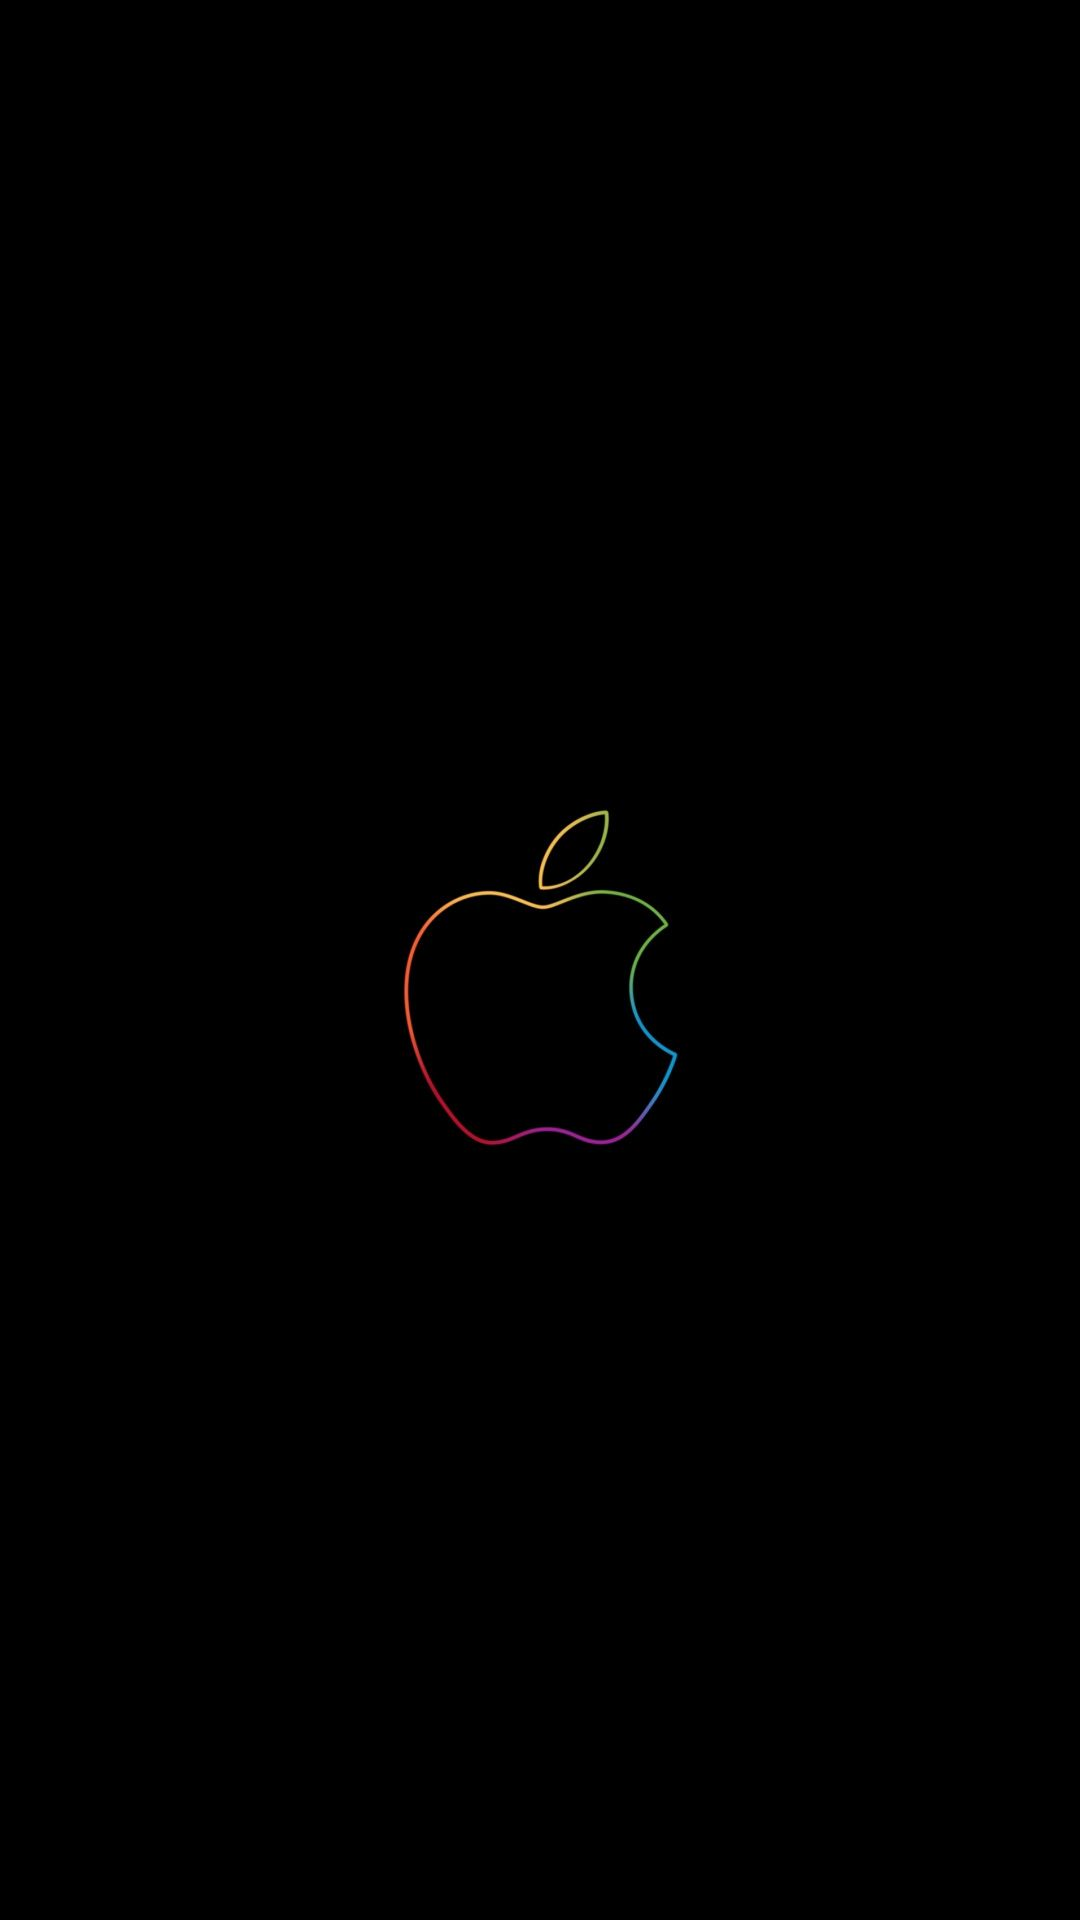 Apple colorful logo minimal 1080x1920 wallpaper Apple logo 1080x1920